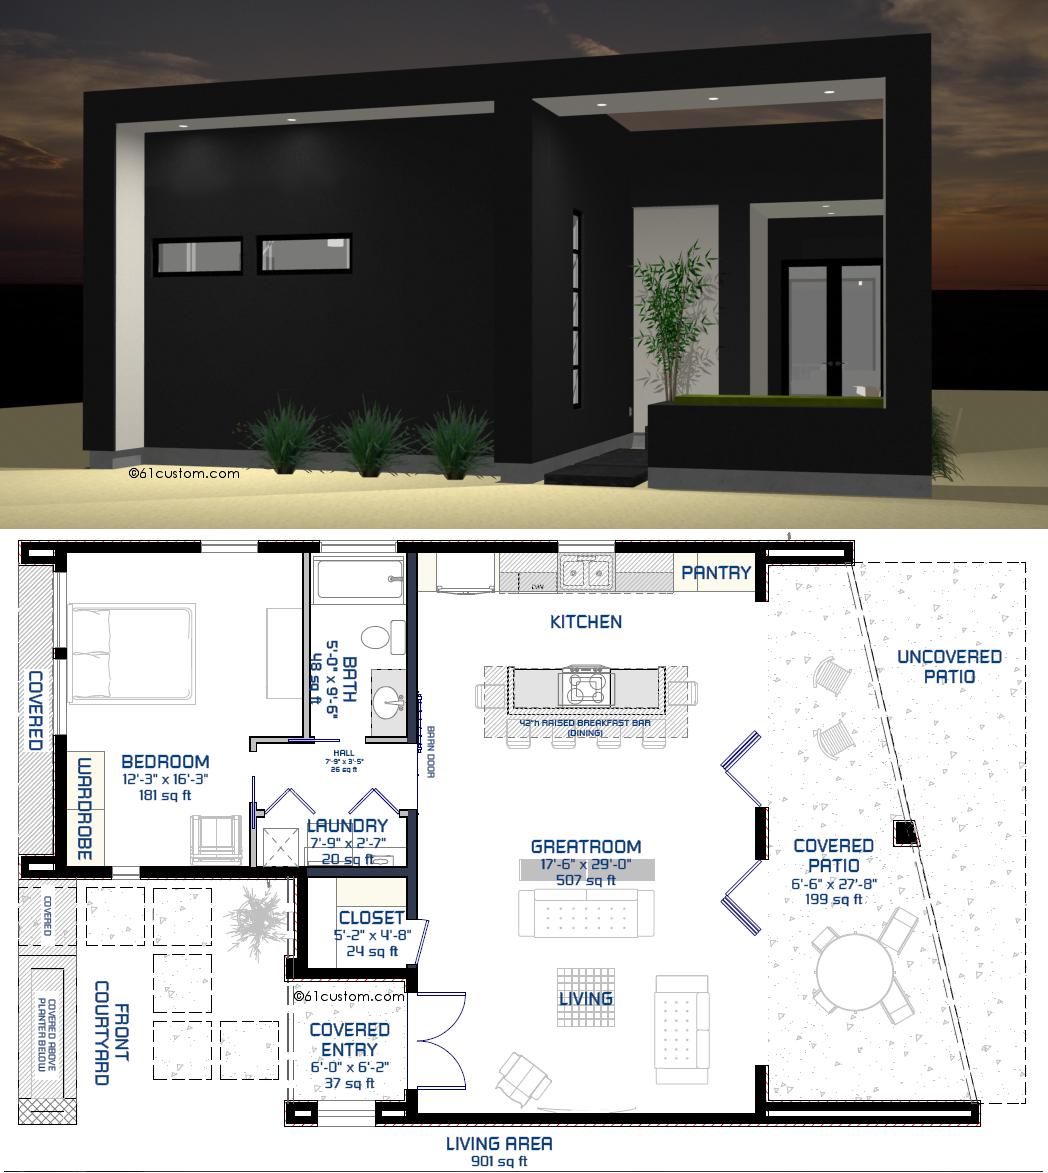 Small Modern Courtyard House Plan 61custom 901sqft 1 Bed